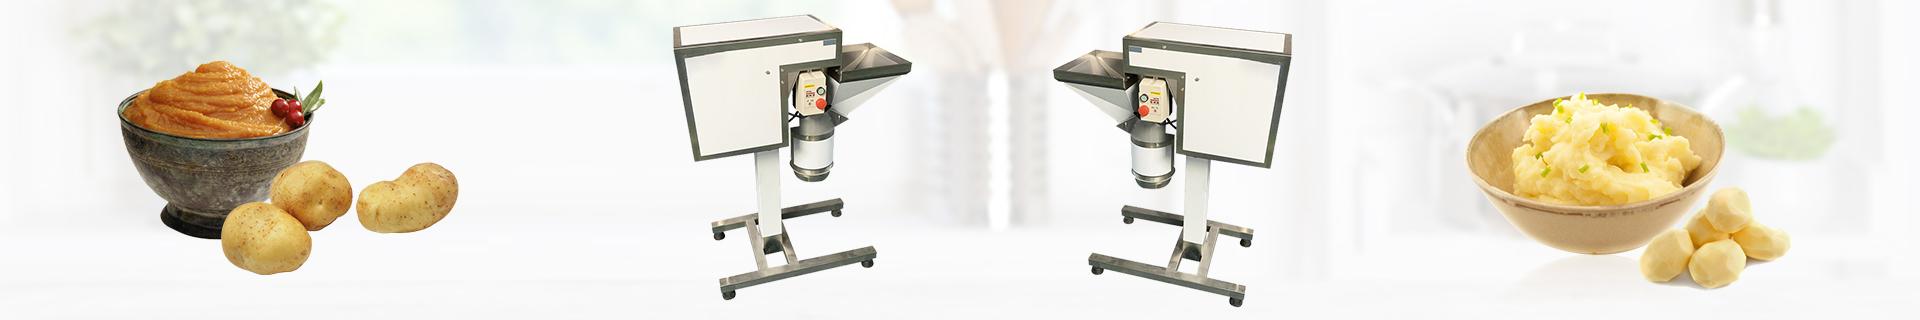 PotatoSnackMachine-Foodprocessingmachine